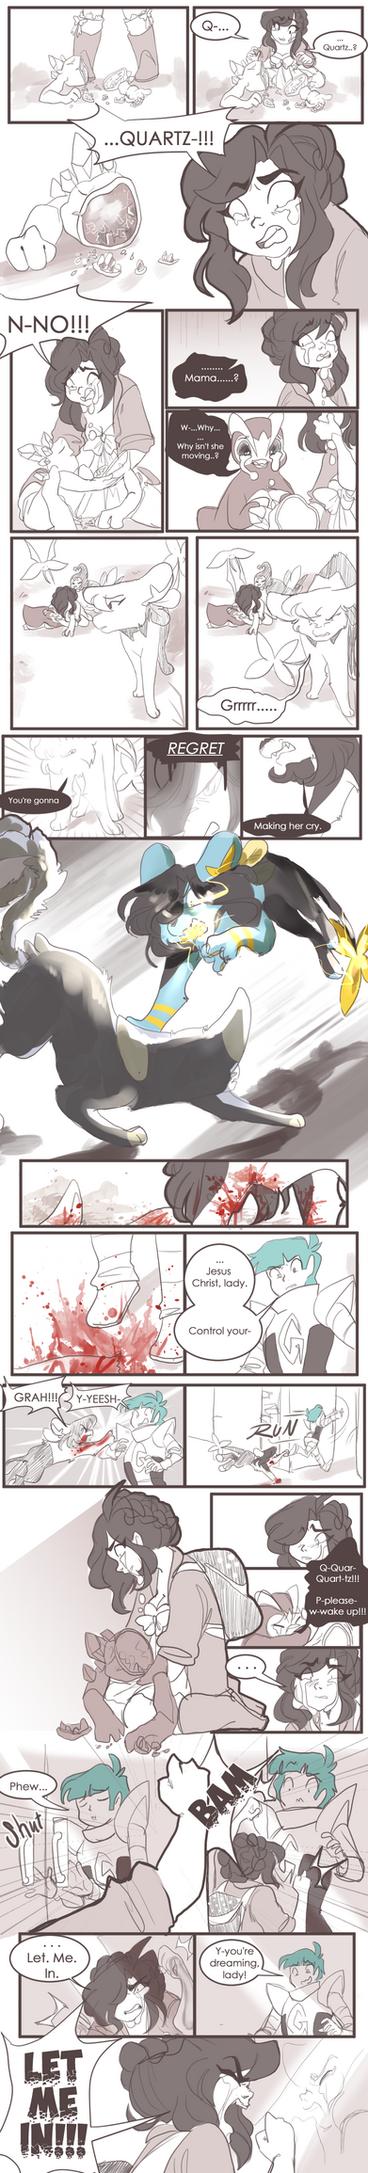 Lissylocke page 14 by Skitea